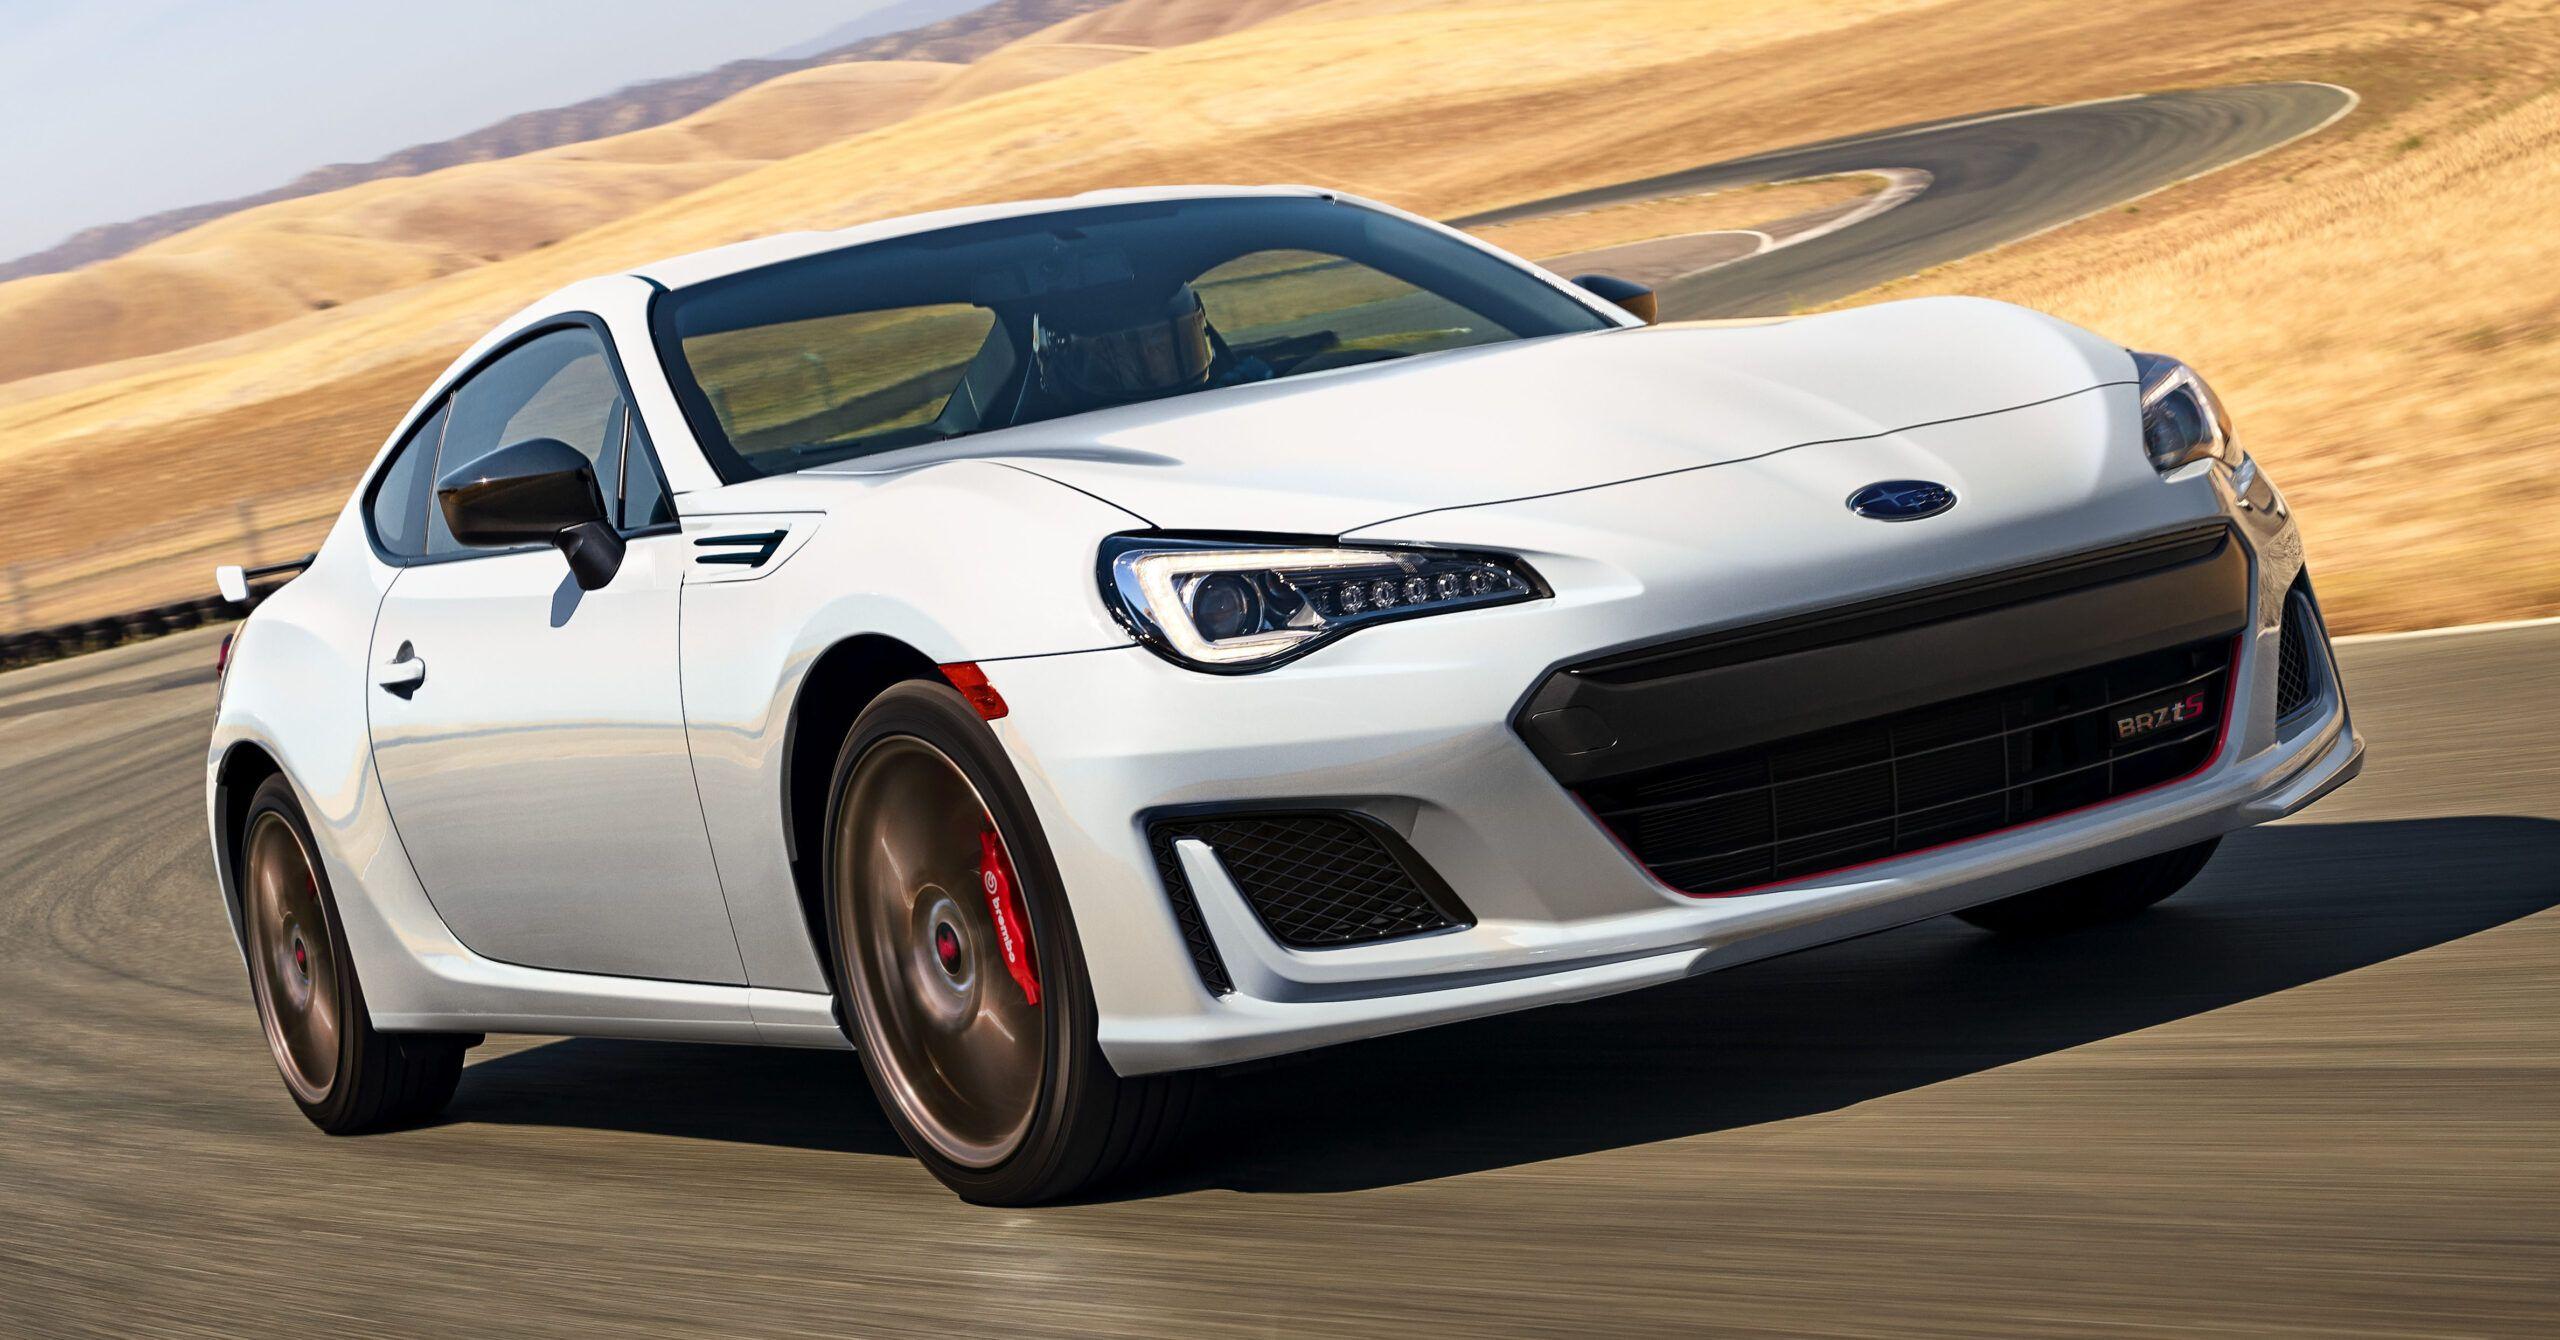 Subaru Brz 2020 Review And Price In 2020 Subaru Brz Subaru Cars Subaru